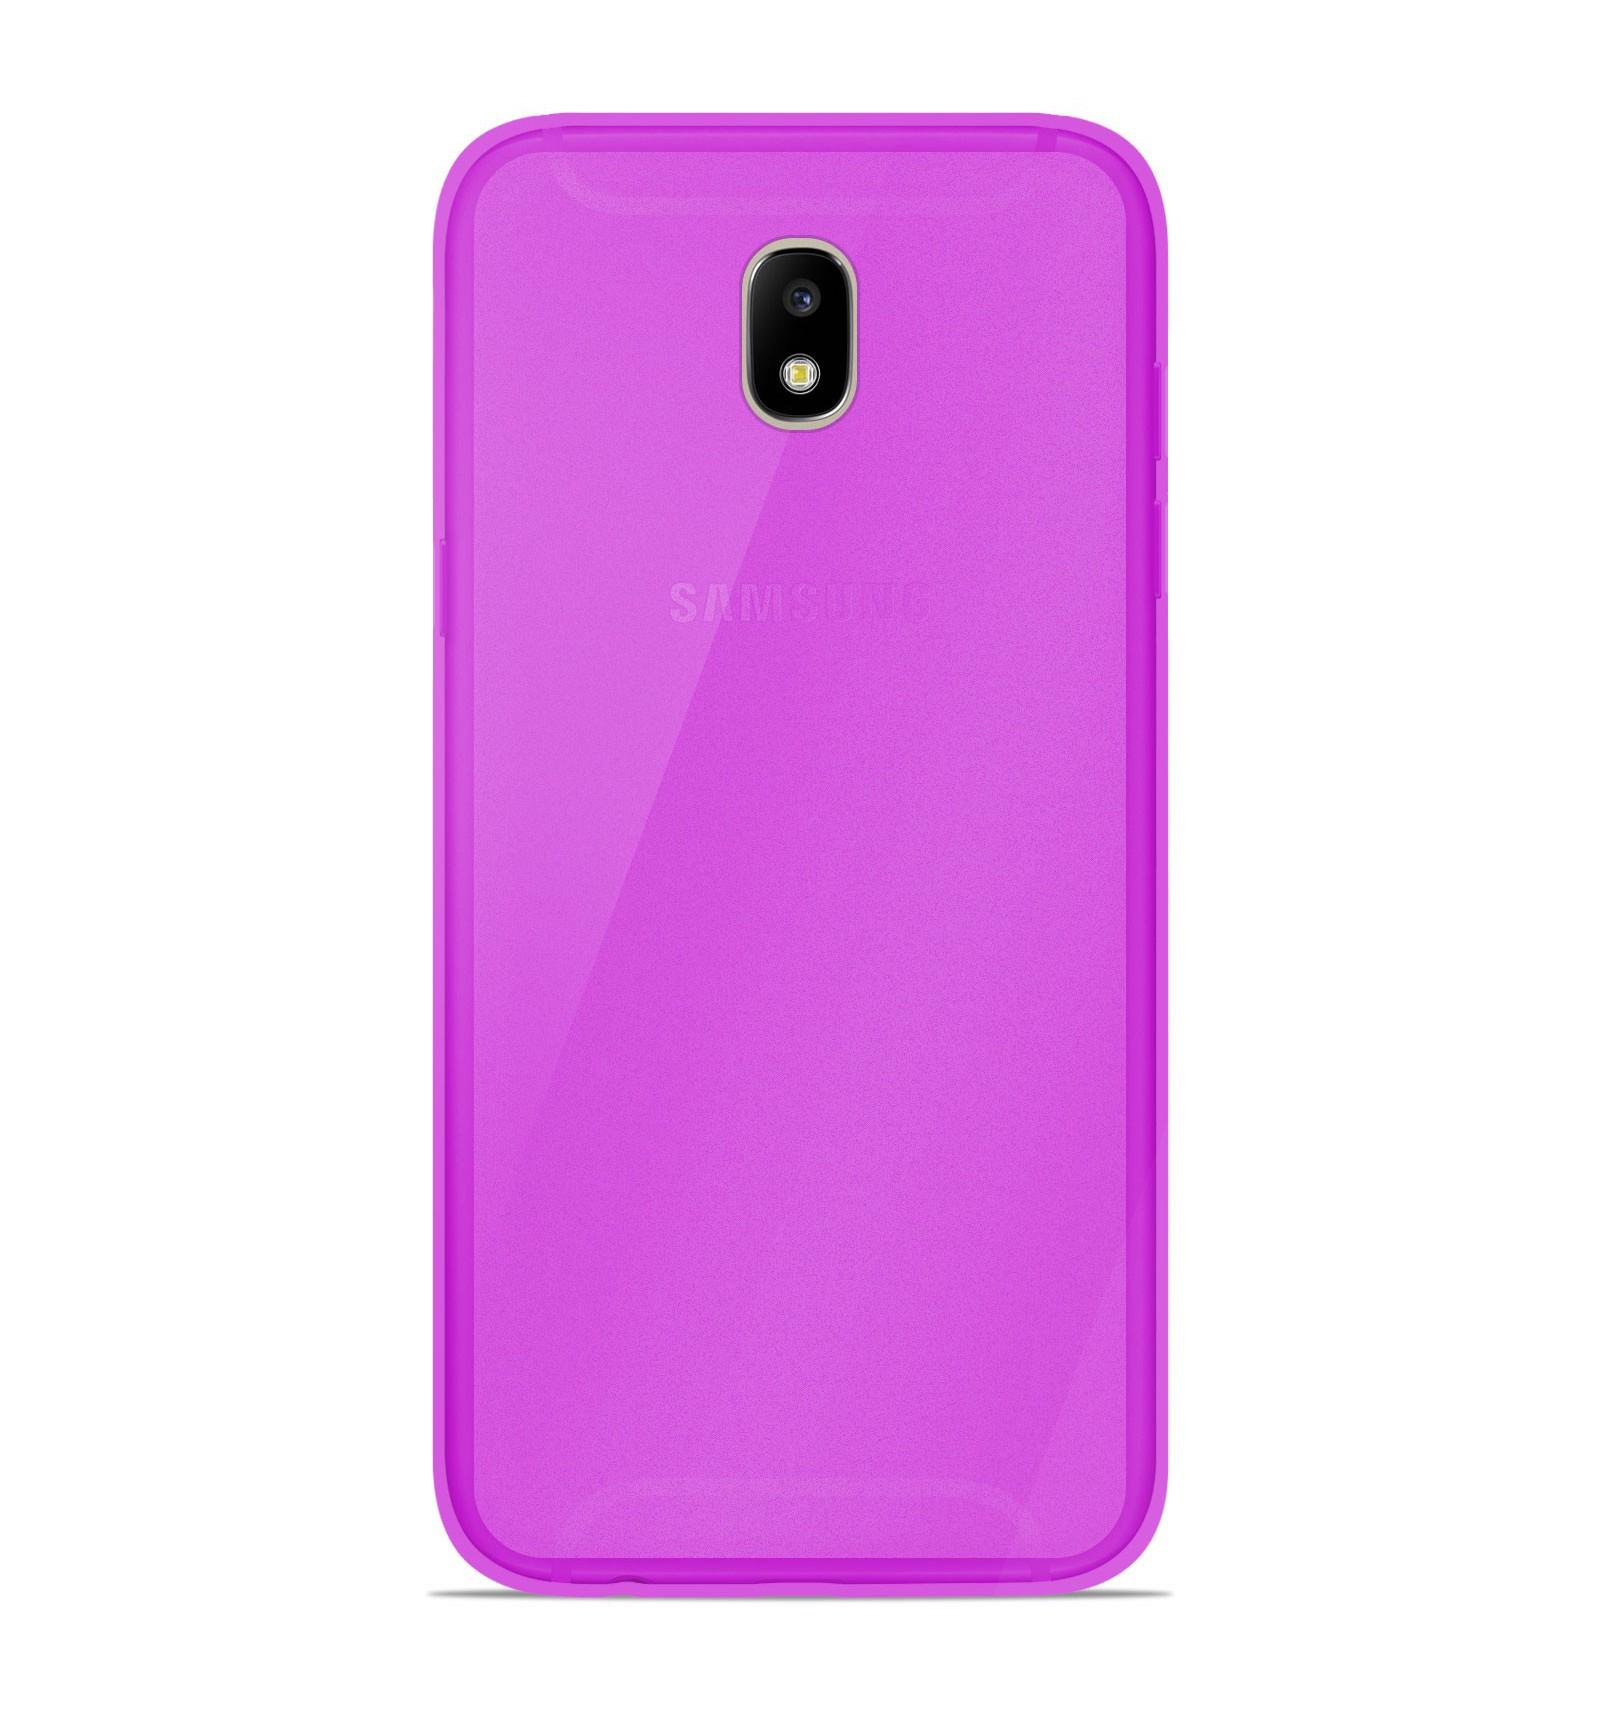 coque samsung galaxy j5 2017 silicone gel givr violet translucide. Black Bedroom Furniture Sets. Home Design Ideas